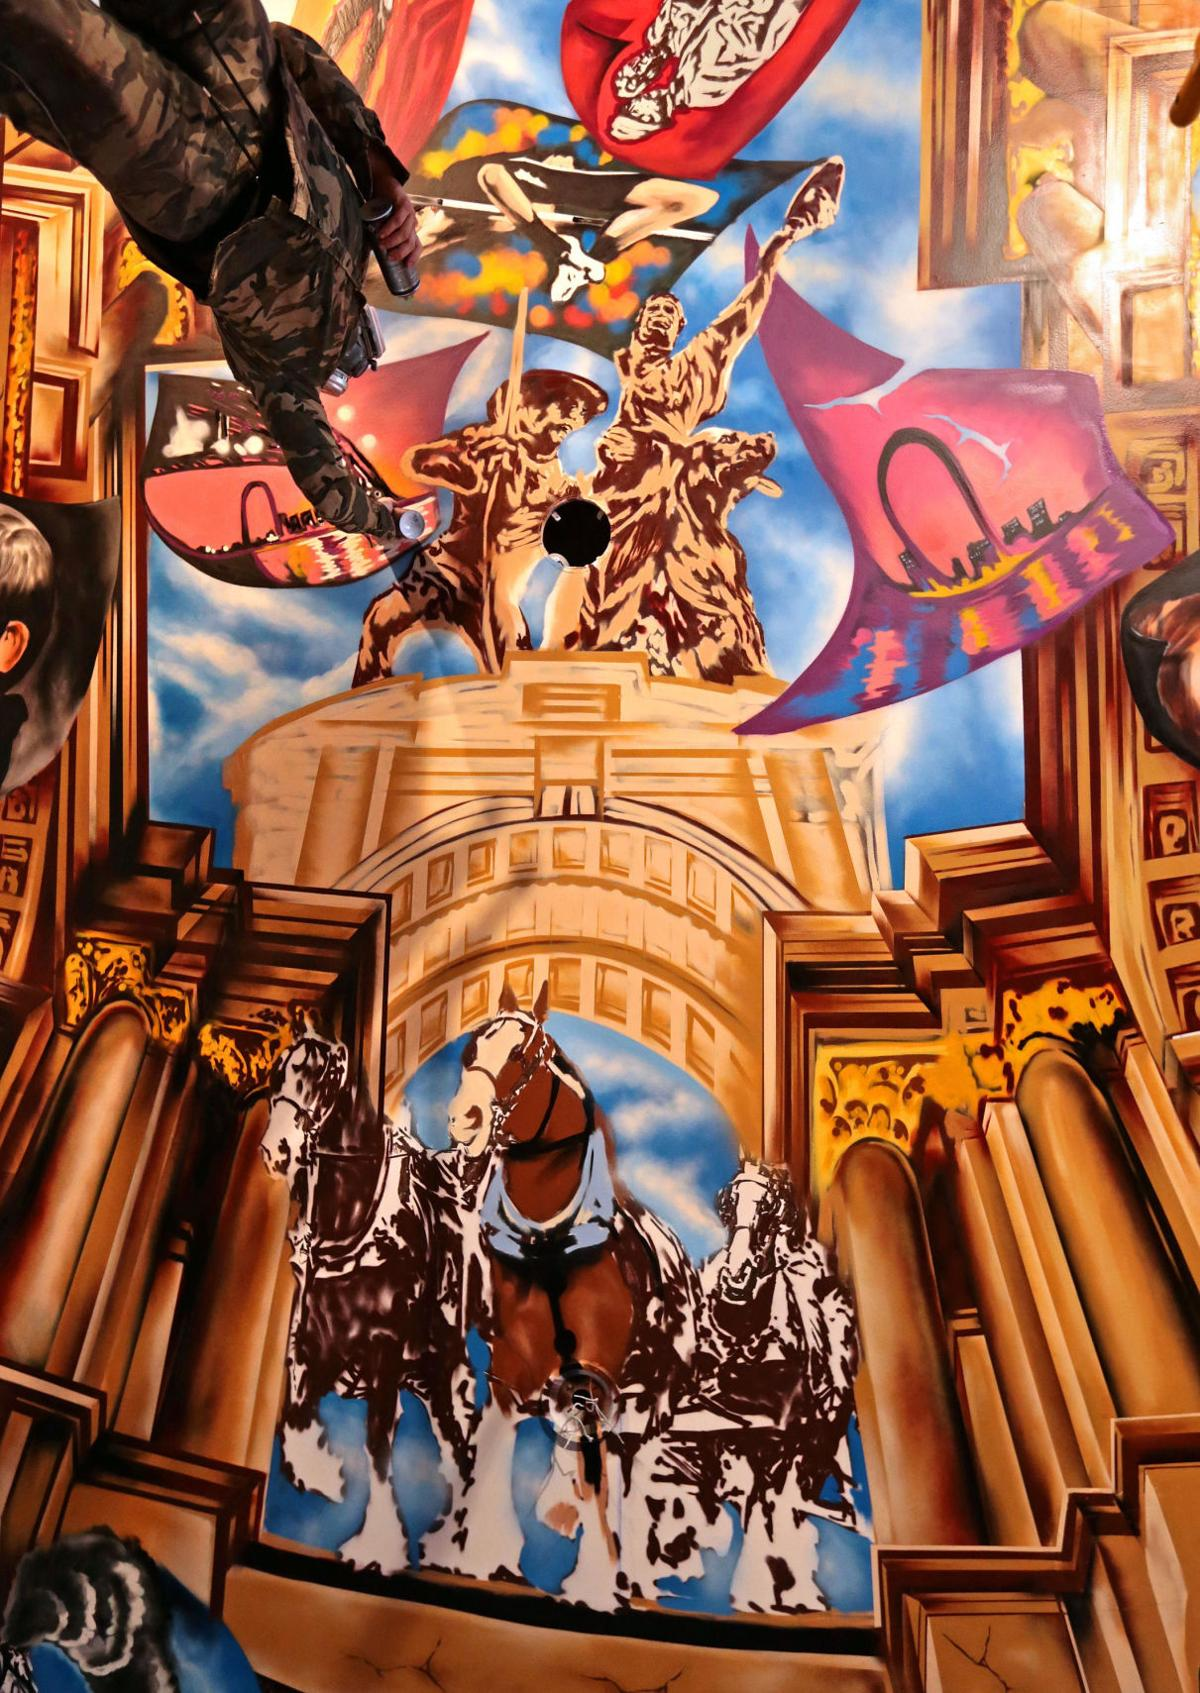 041517STLD-Paco-Rosic-mural-4